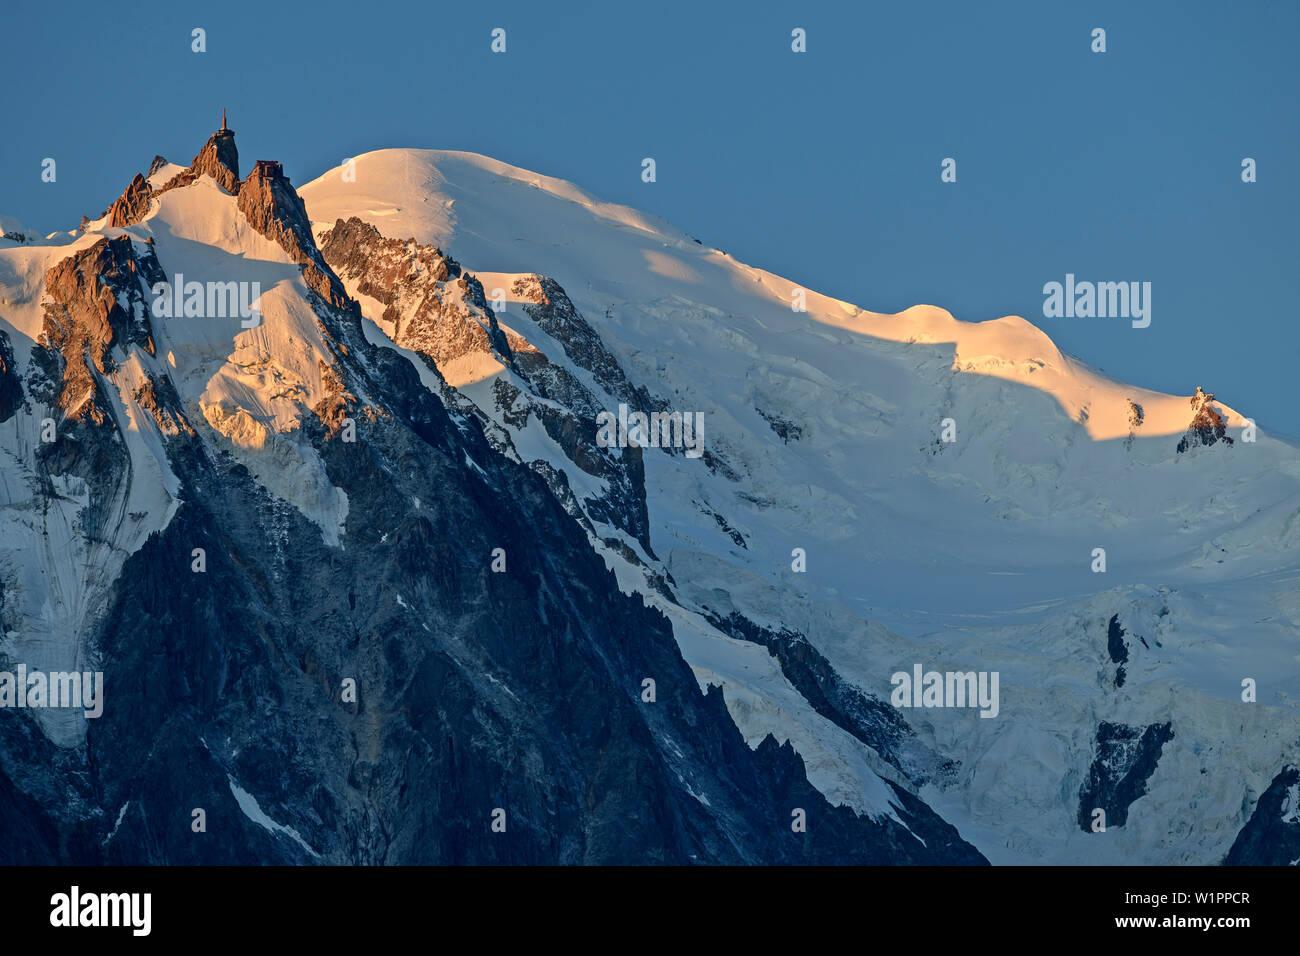 The Aiguille du Midi and Mont Blanc, Mont Blanc, Grajische Alps, the Savoy Alps, Savoie, France - Stock Image